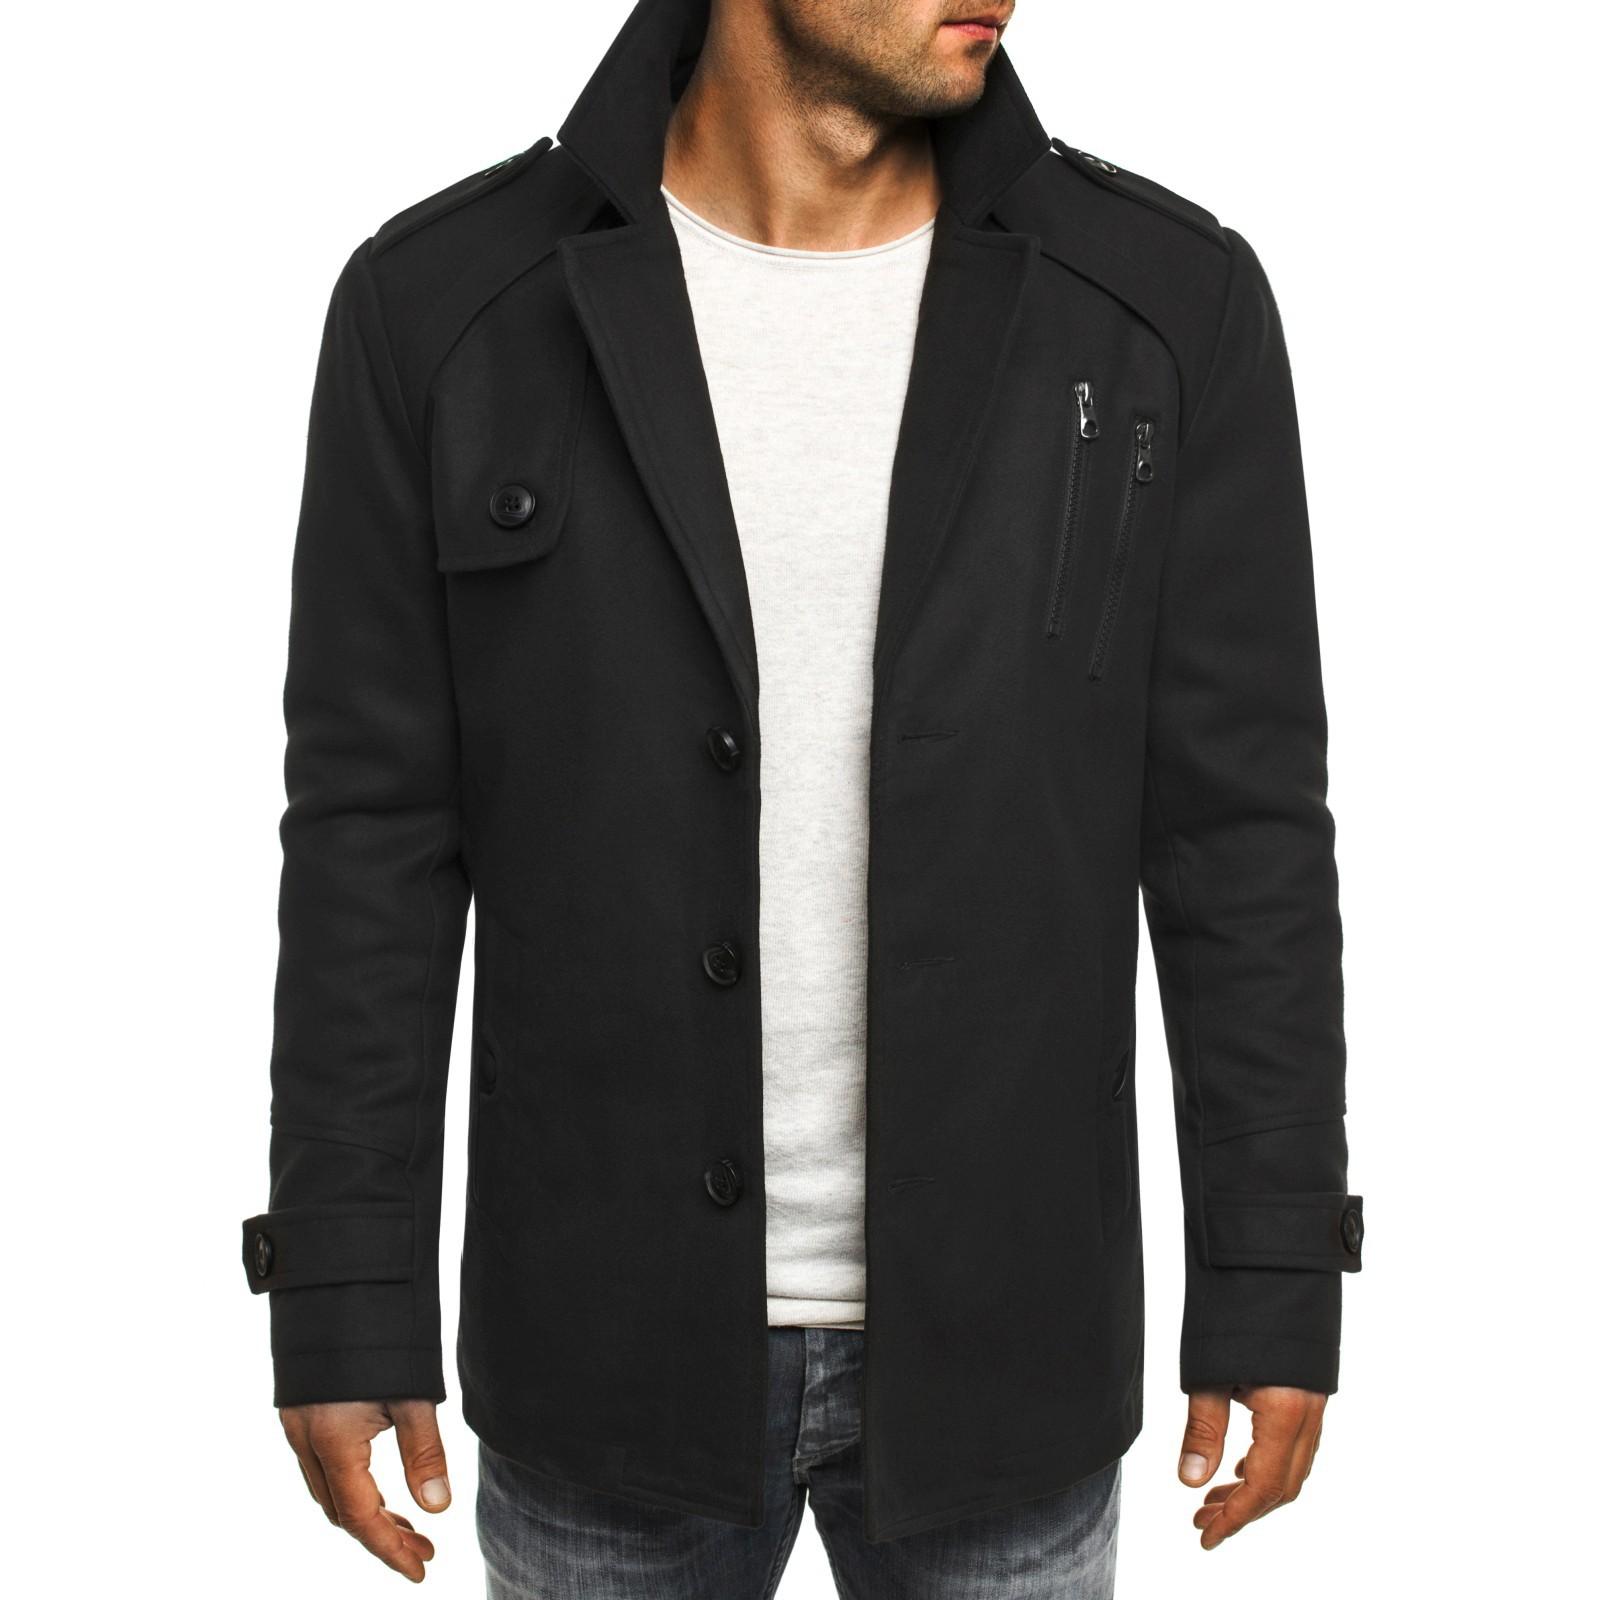 ozonee herren wintermantel mantel winterjacke w rmemantel kapuzenmantel mix ebay. Black Bedroom Furniture Sets. Home Design Ideas